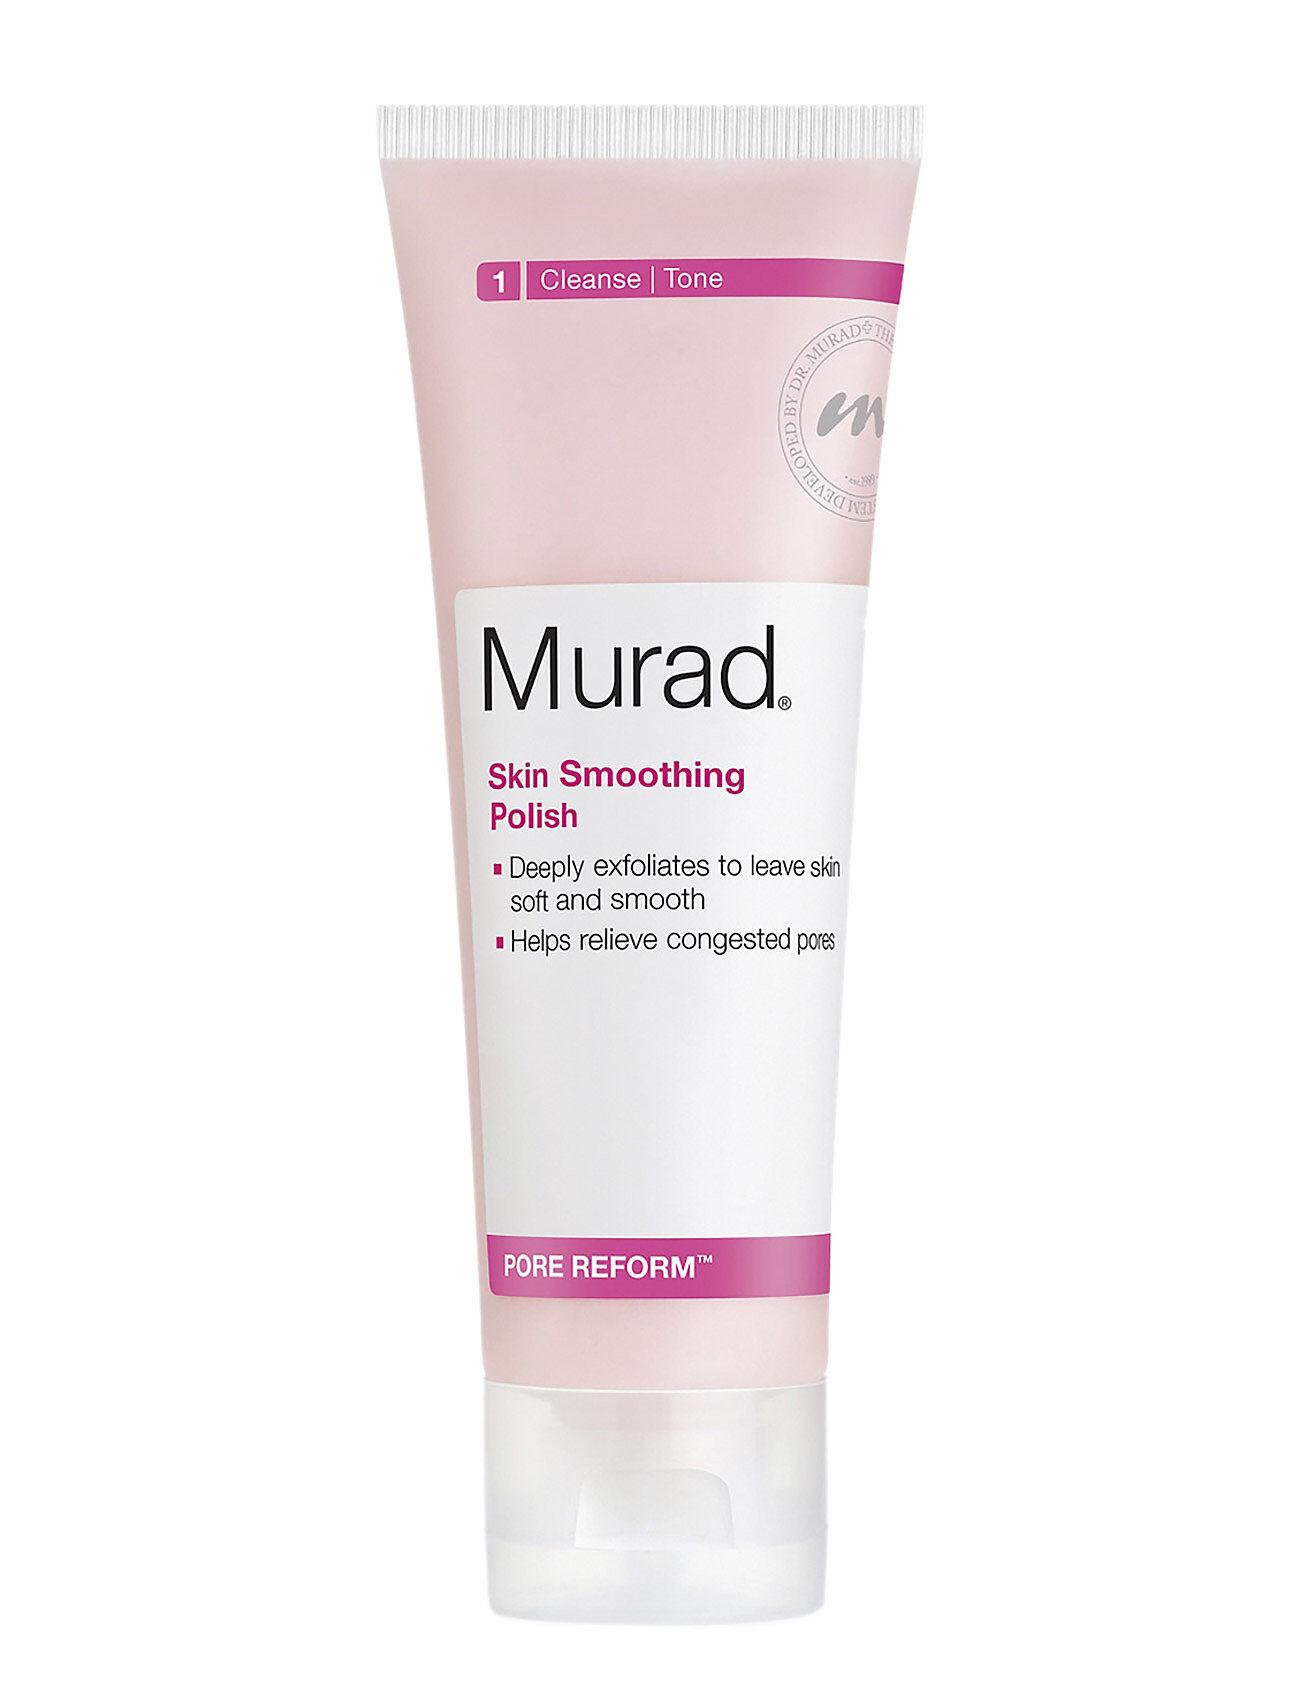 Murad Pore Reform Skin Smoothing Polish Kuorinta-aine Ihonhoito Nude Murad